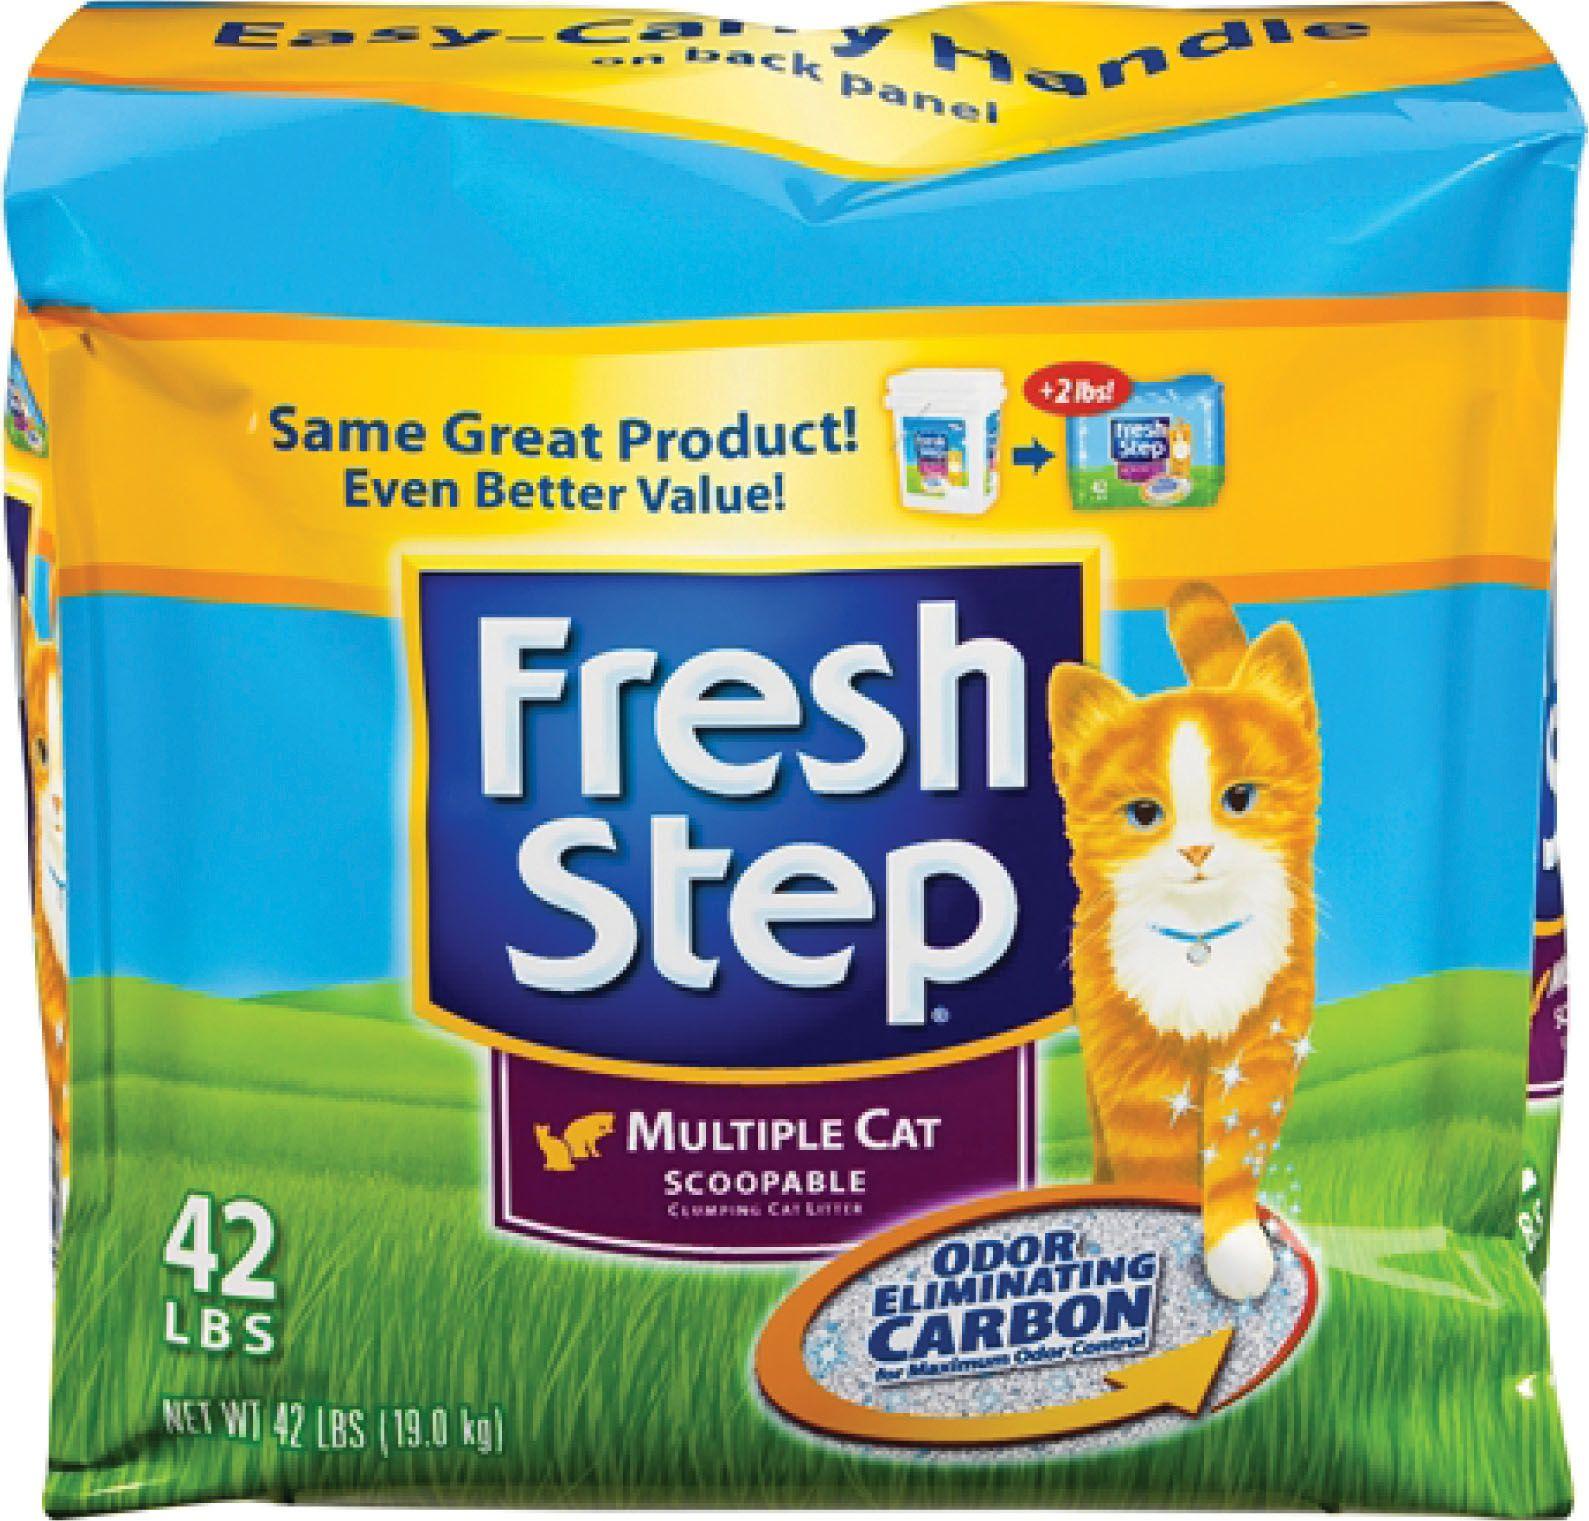 Cats Fresh Step Multicat Clumping Litter By Clorox